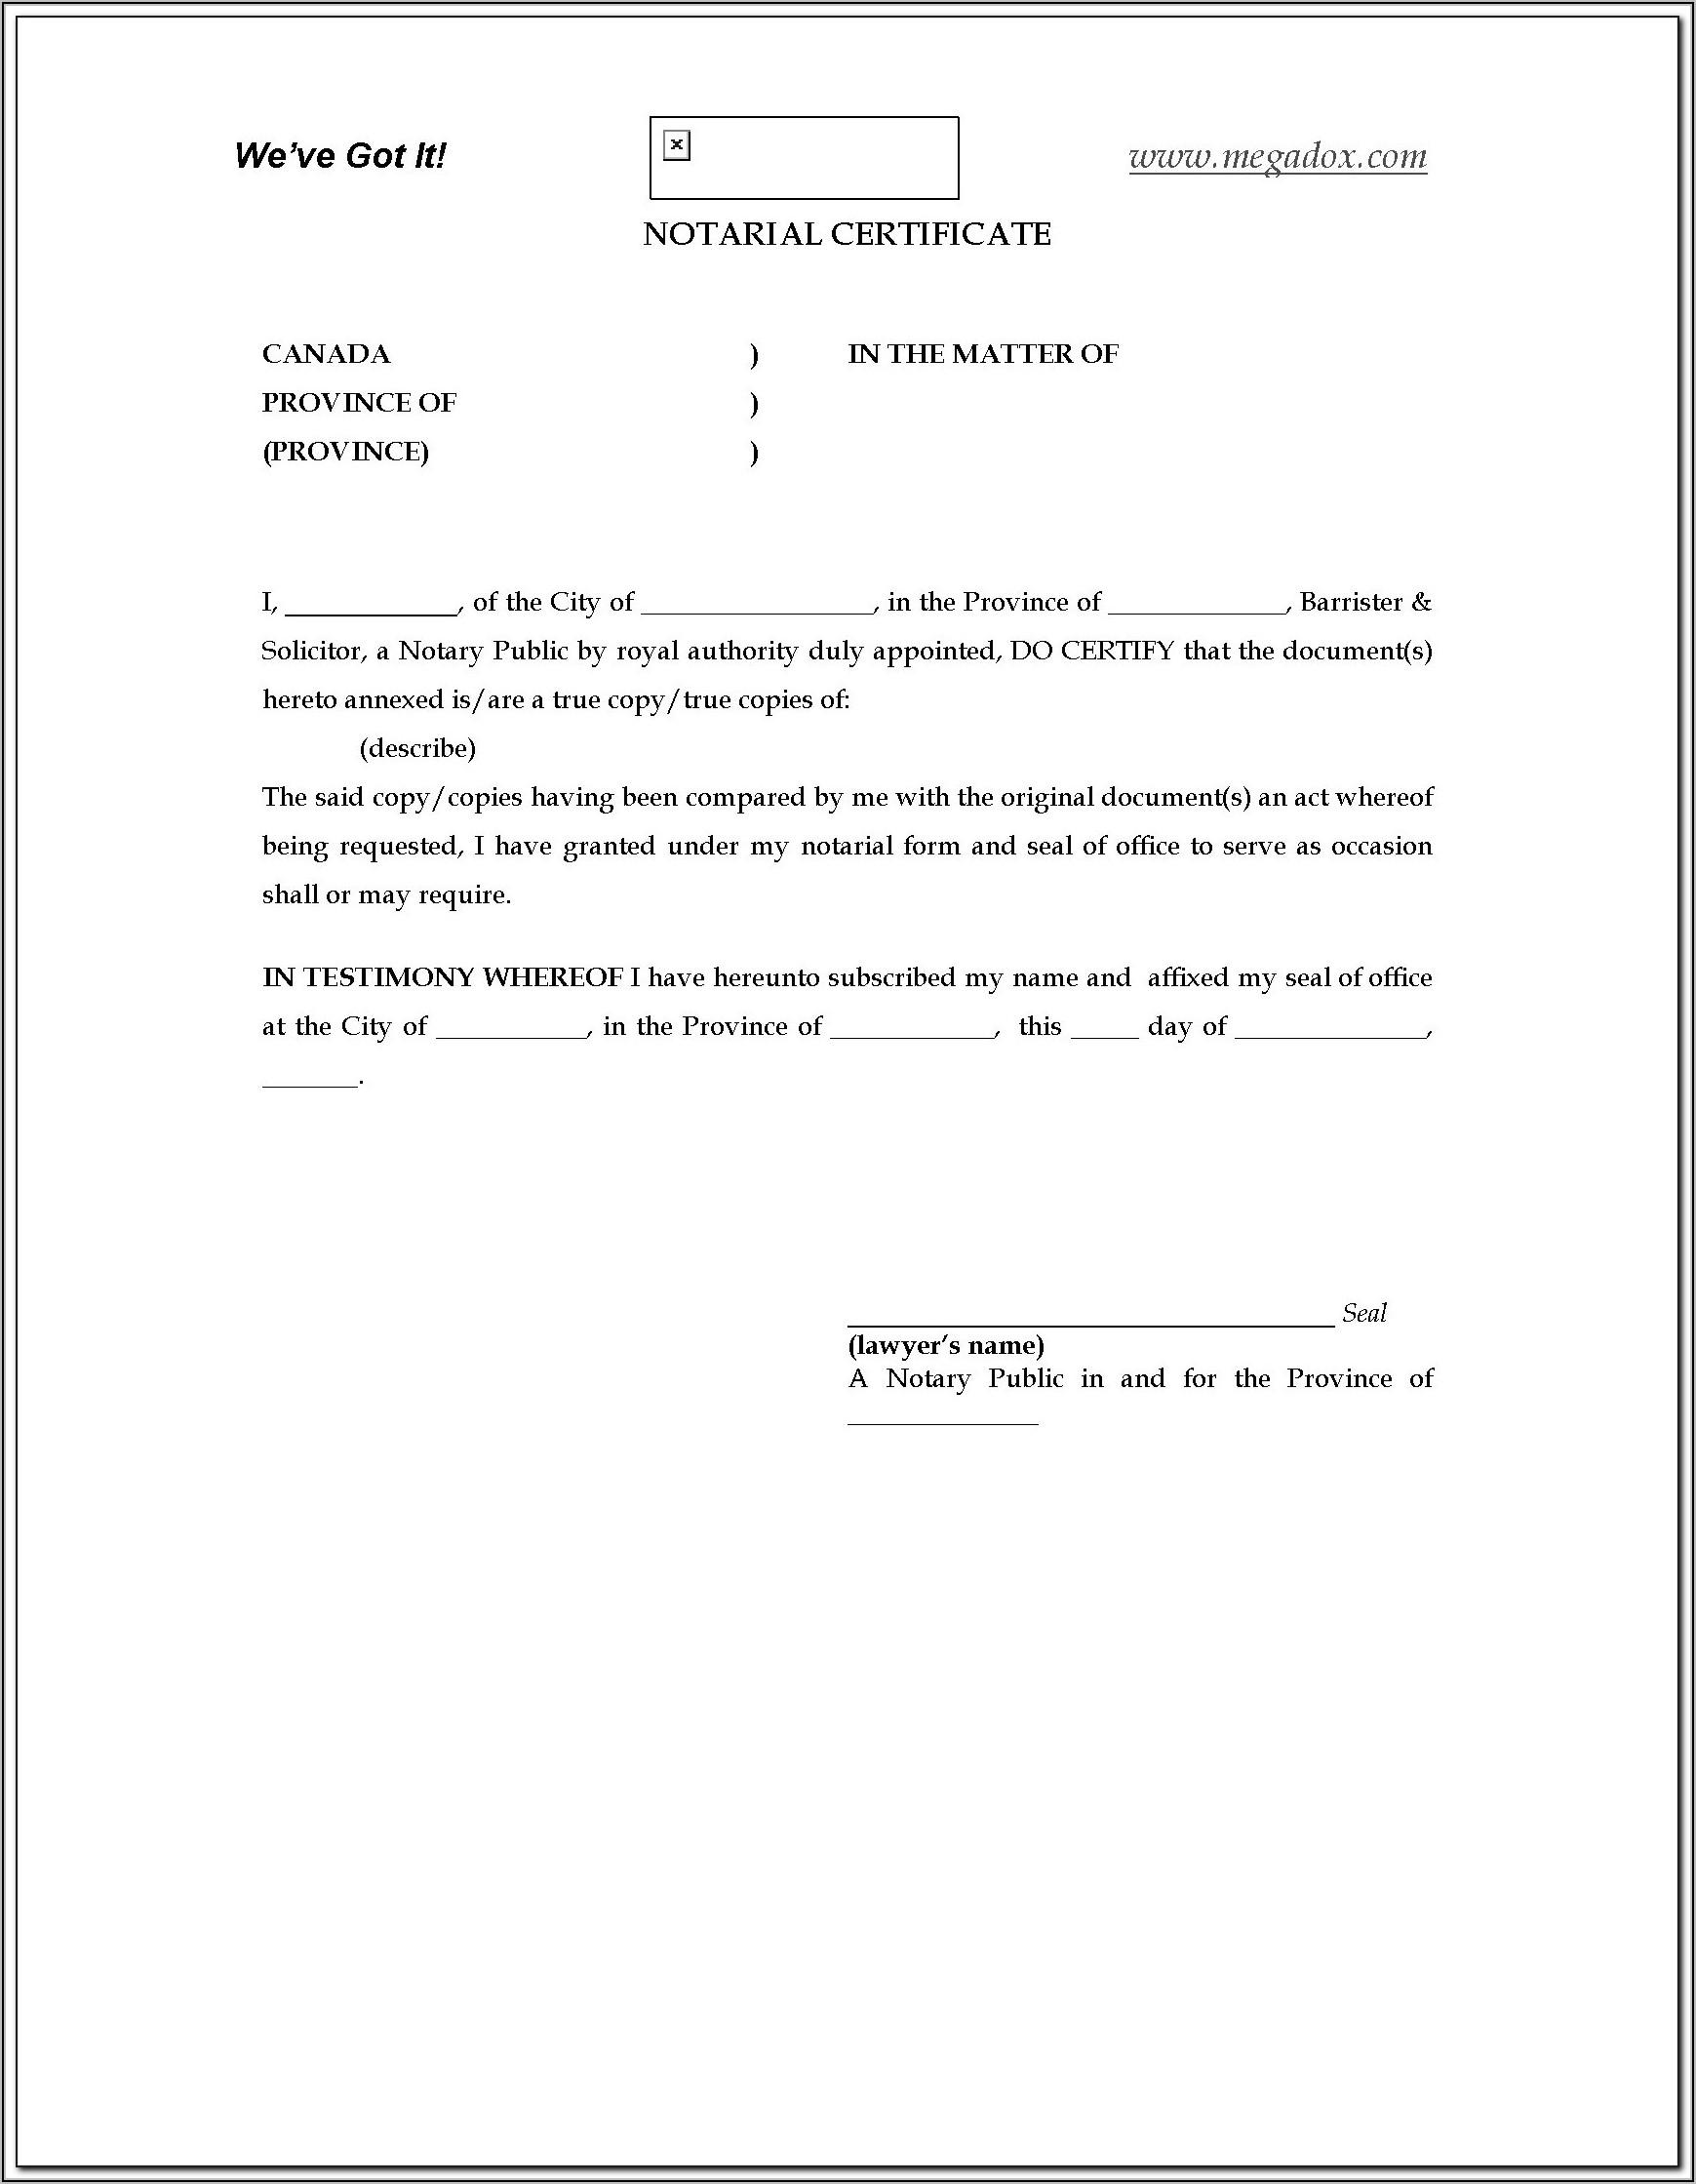 Notarial Certificate Format In India